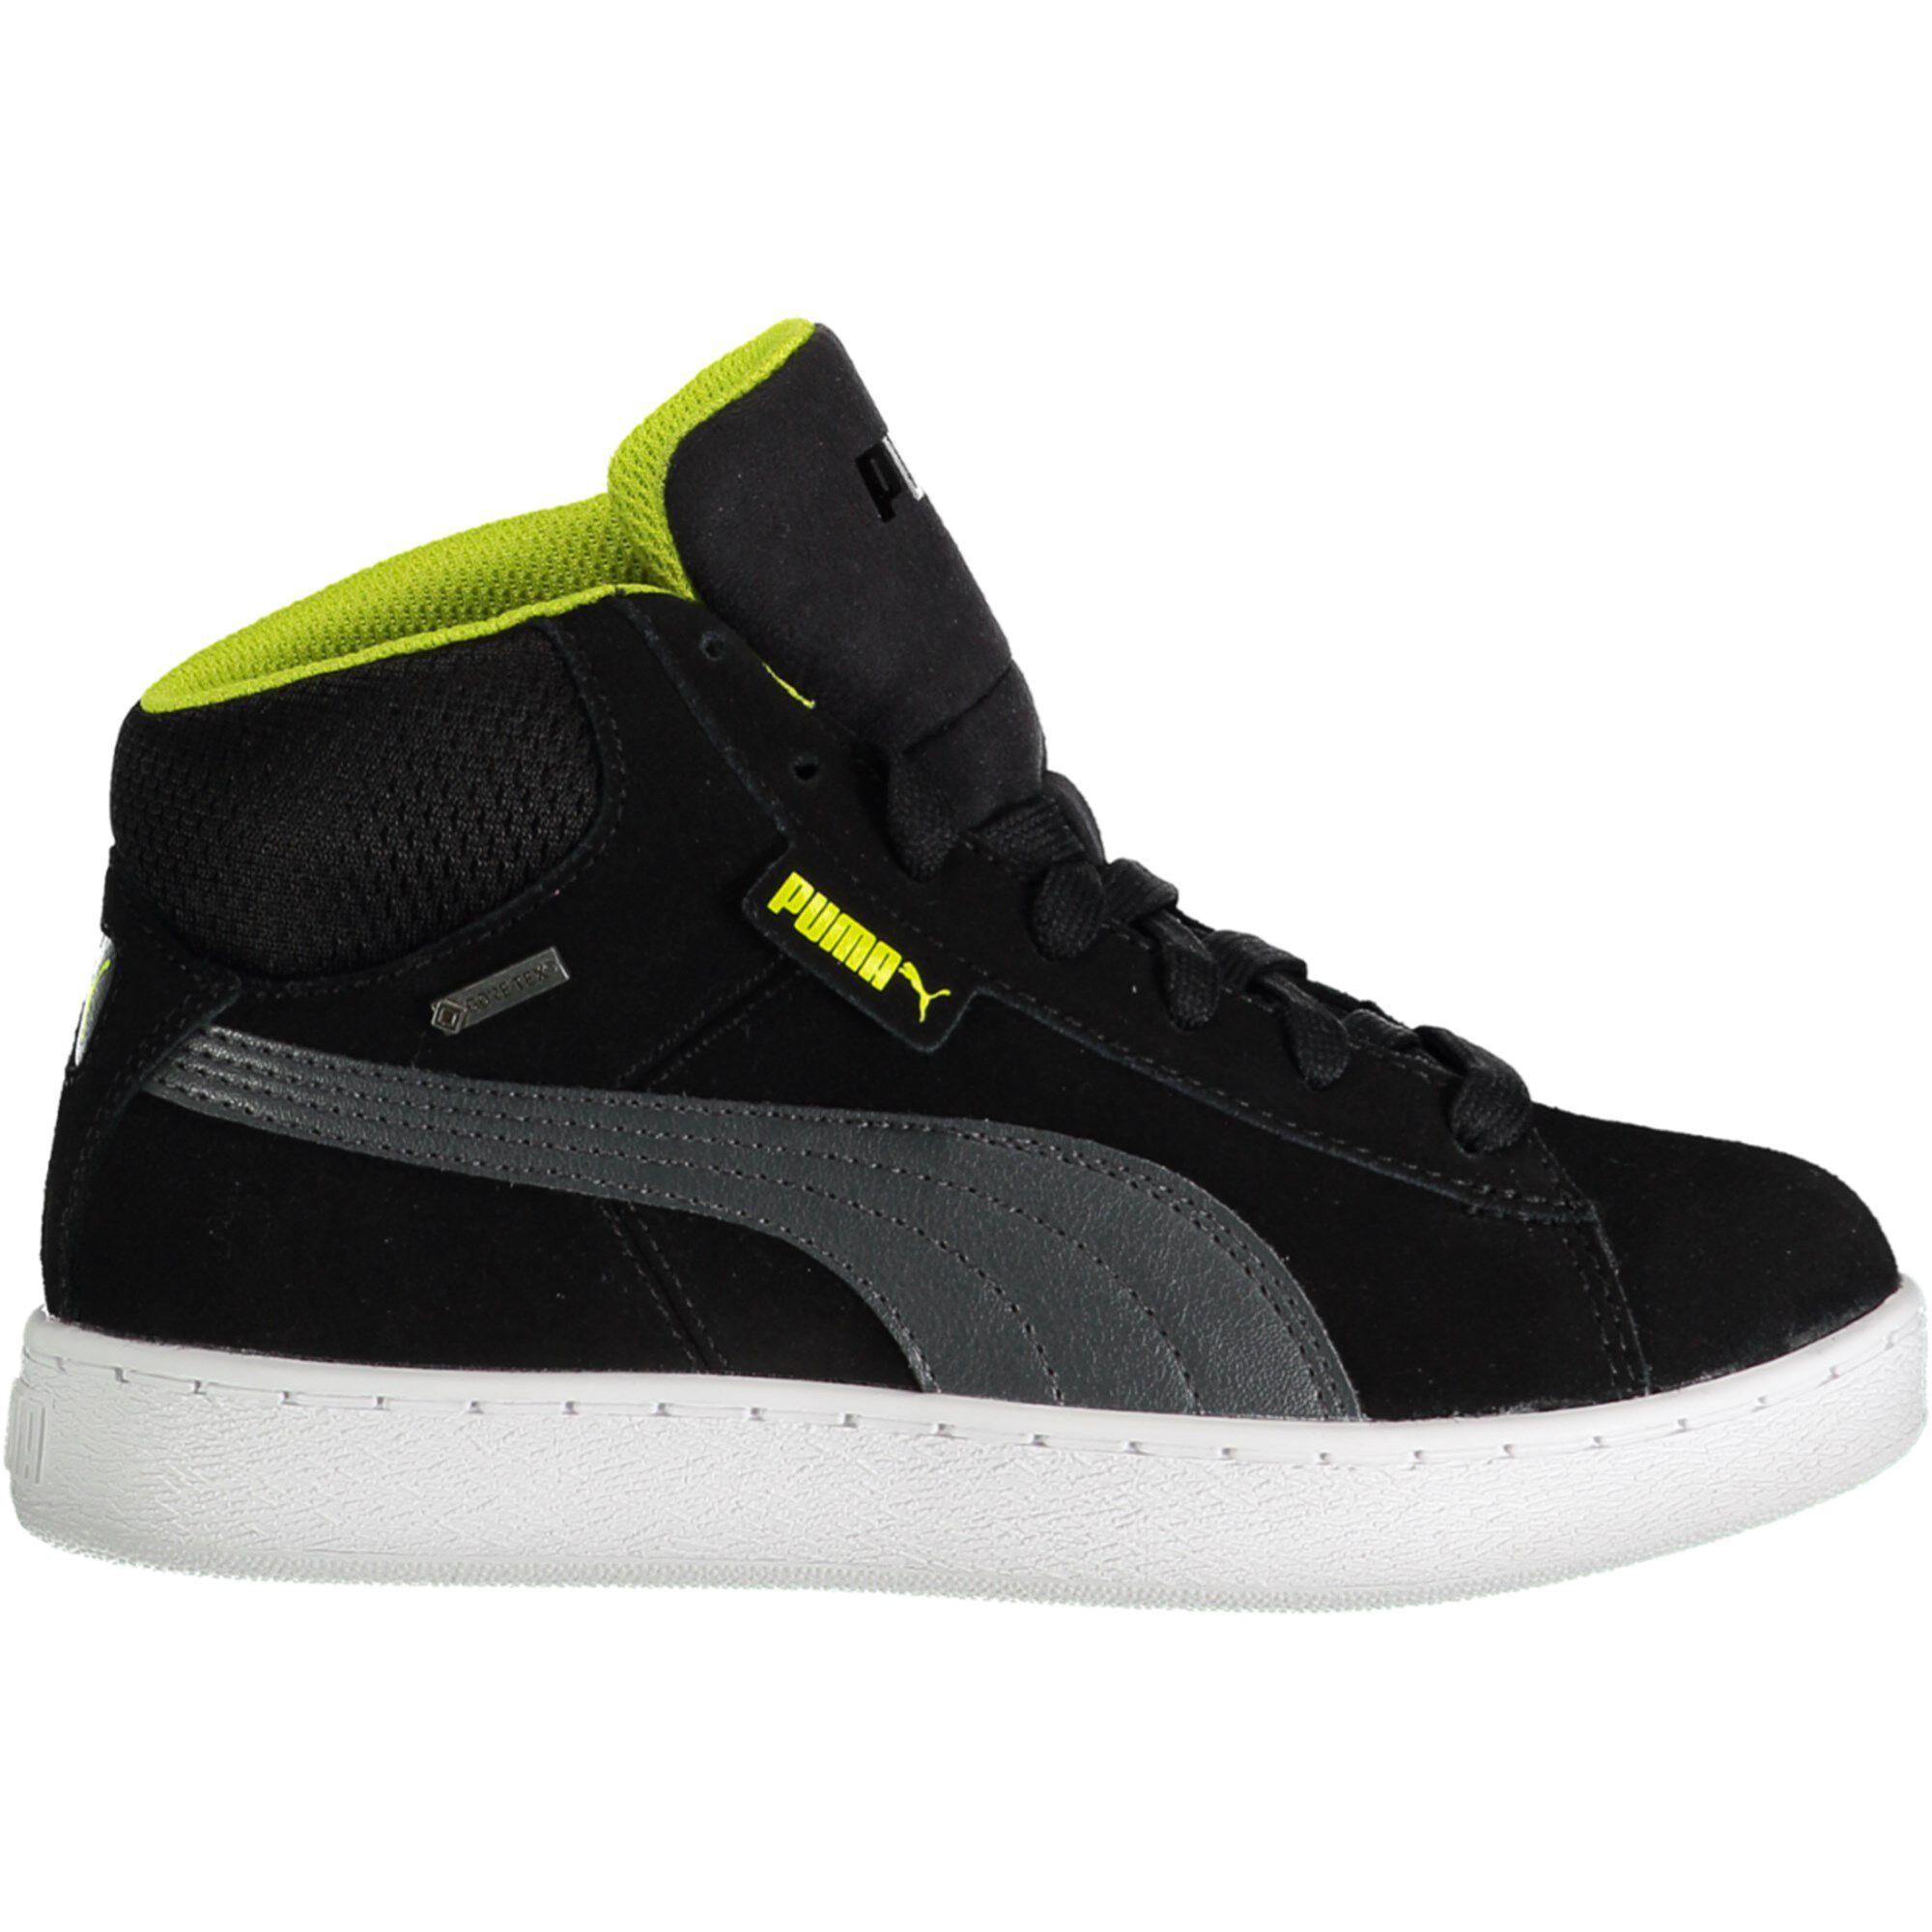 Størrelsesguide Puma herre Puma håndbold sko og tøj